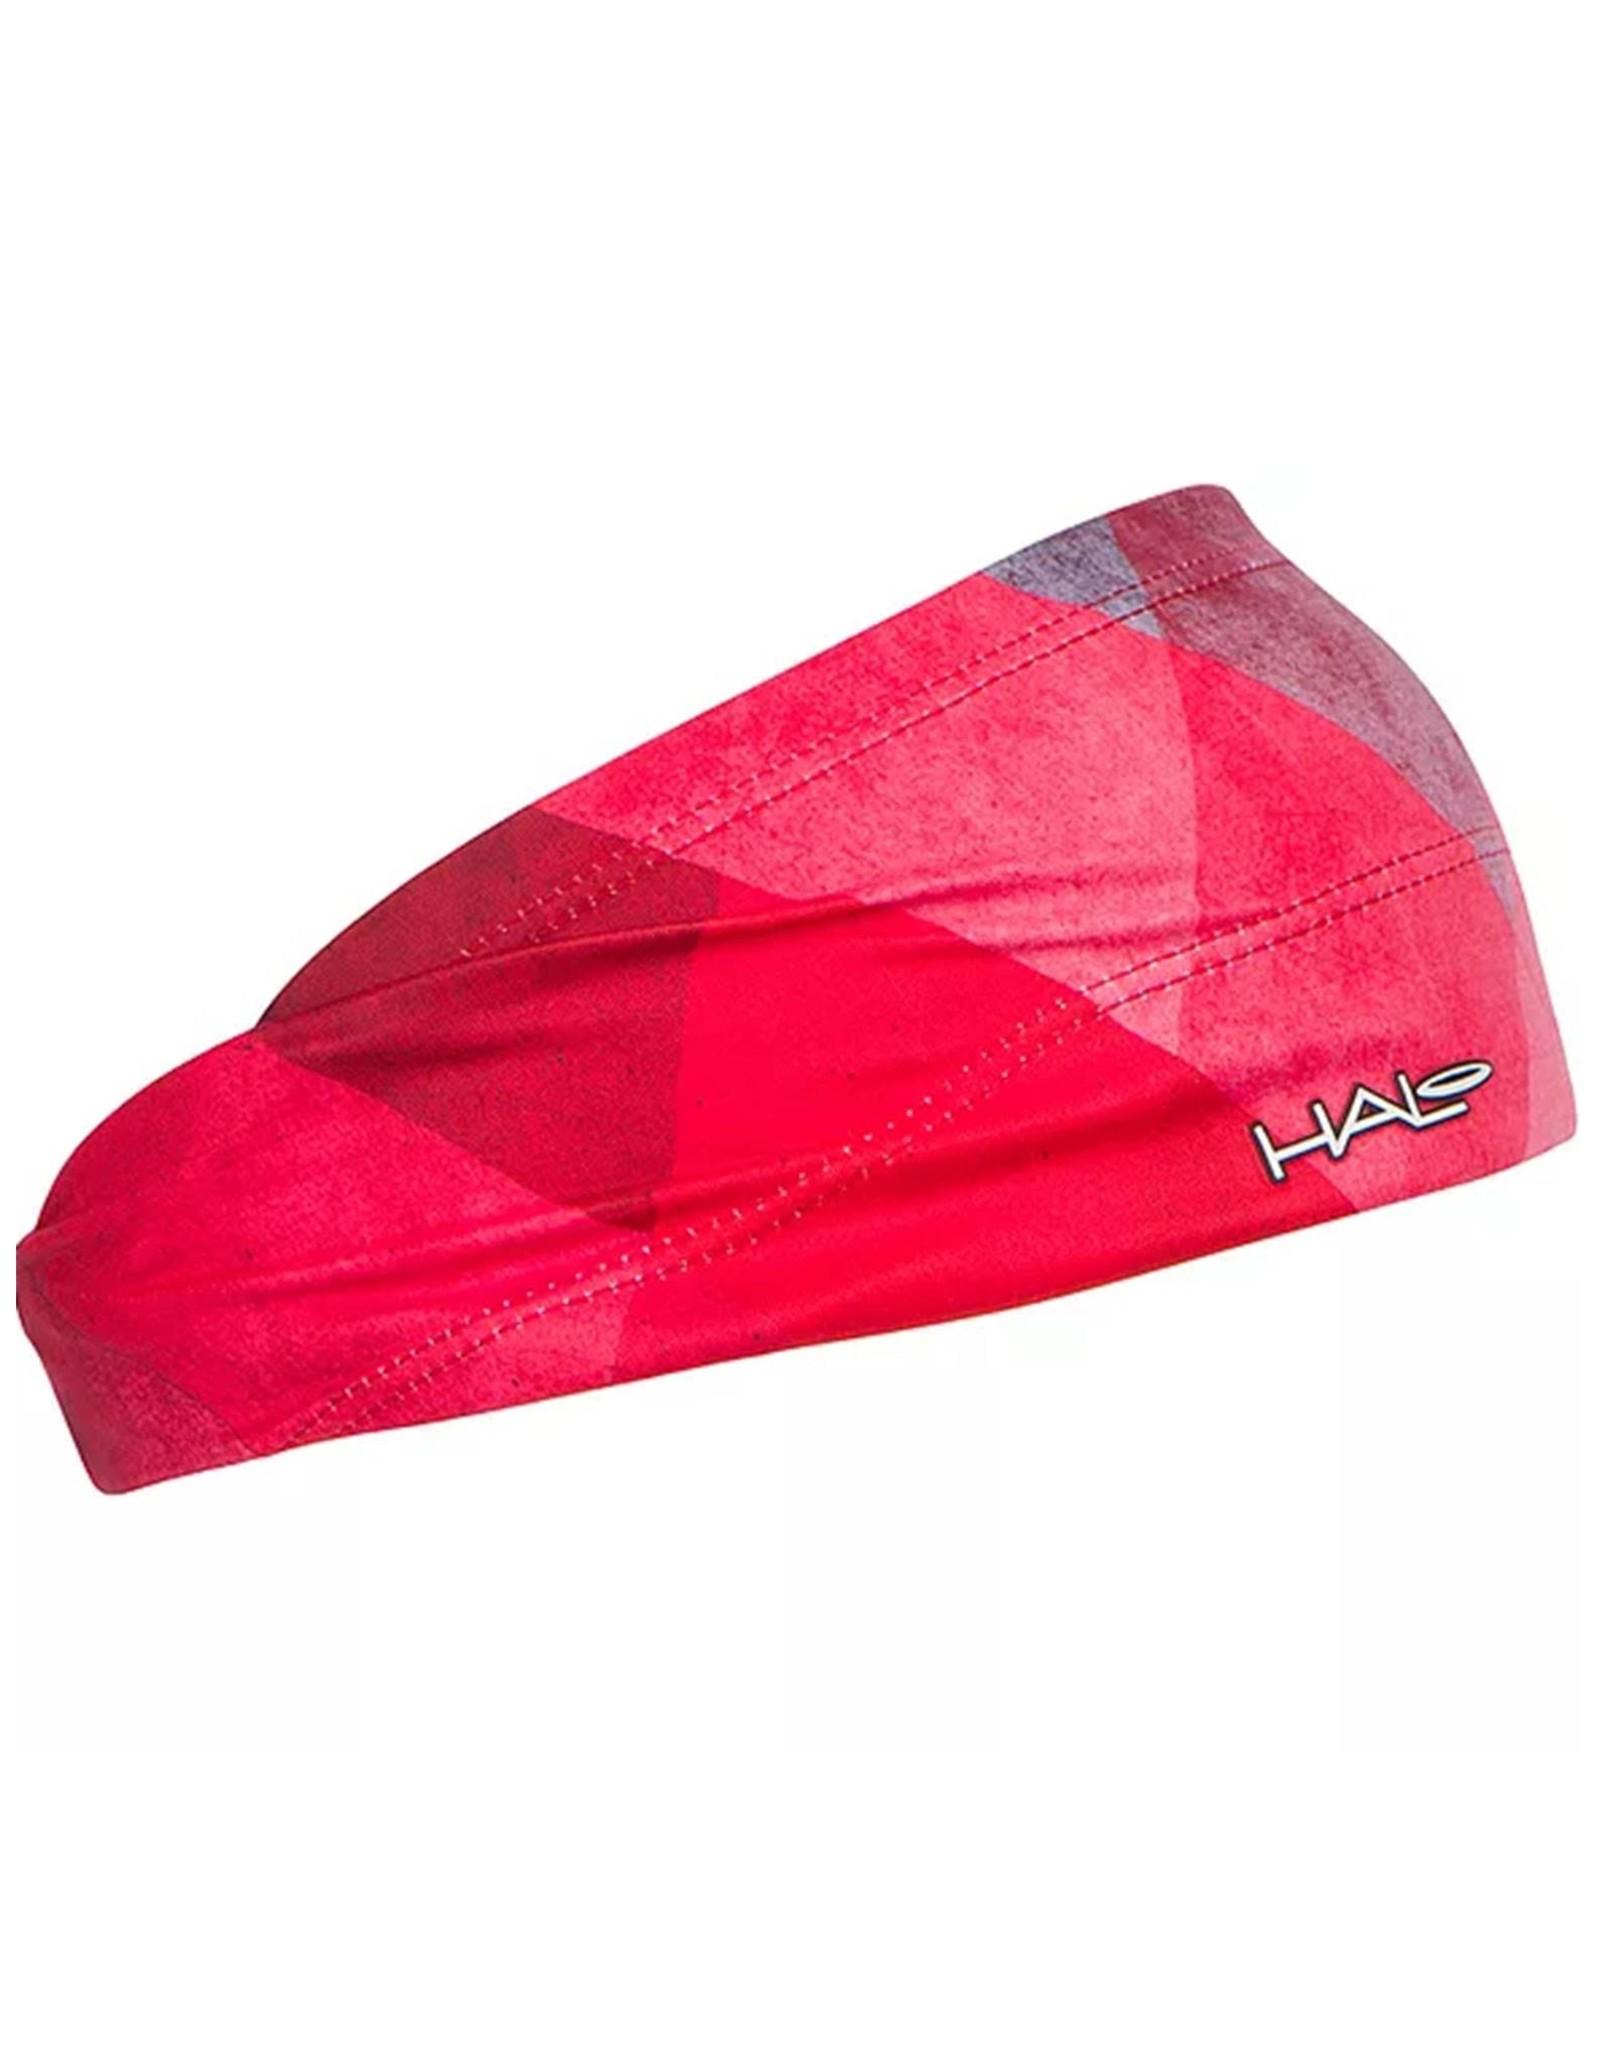 Halo Bandit Headband Lava